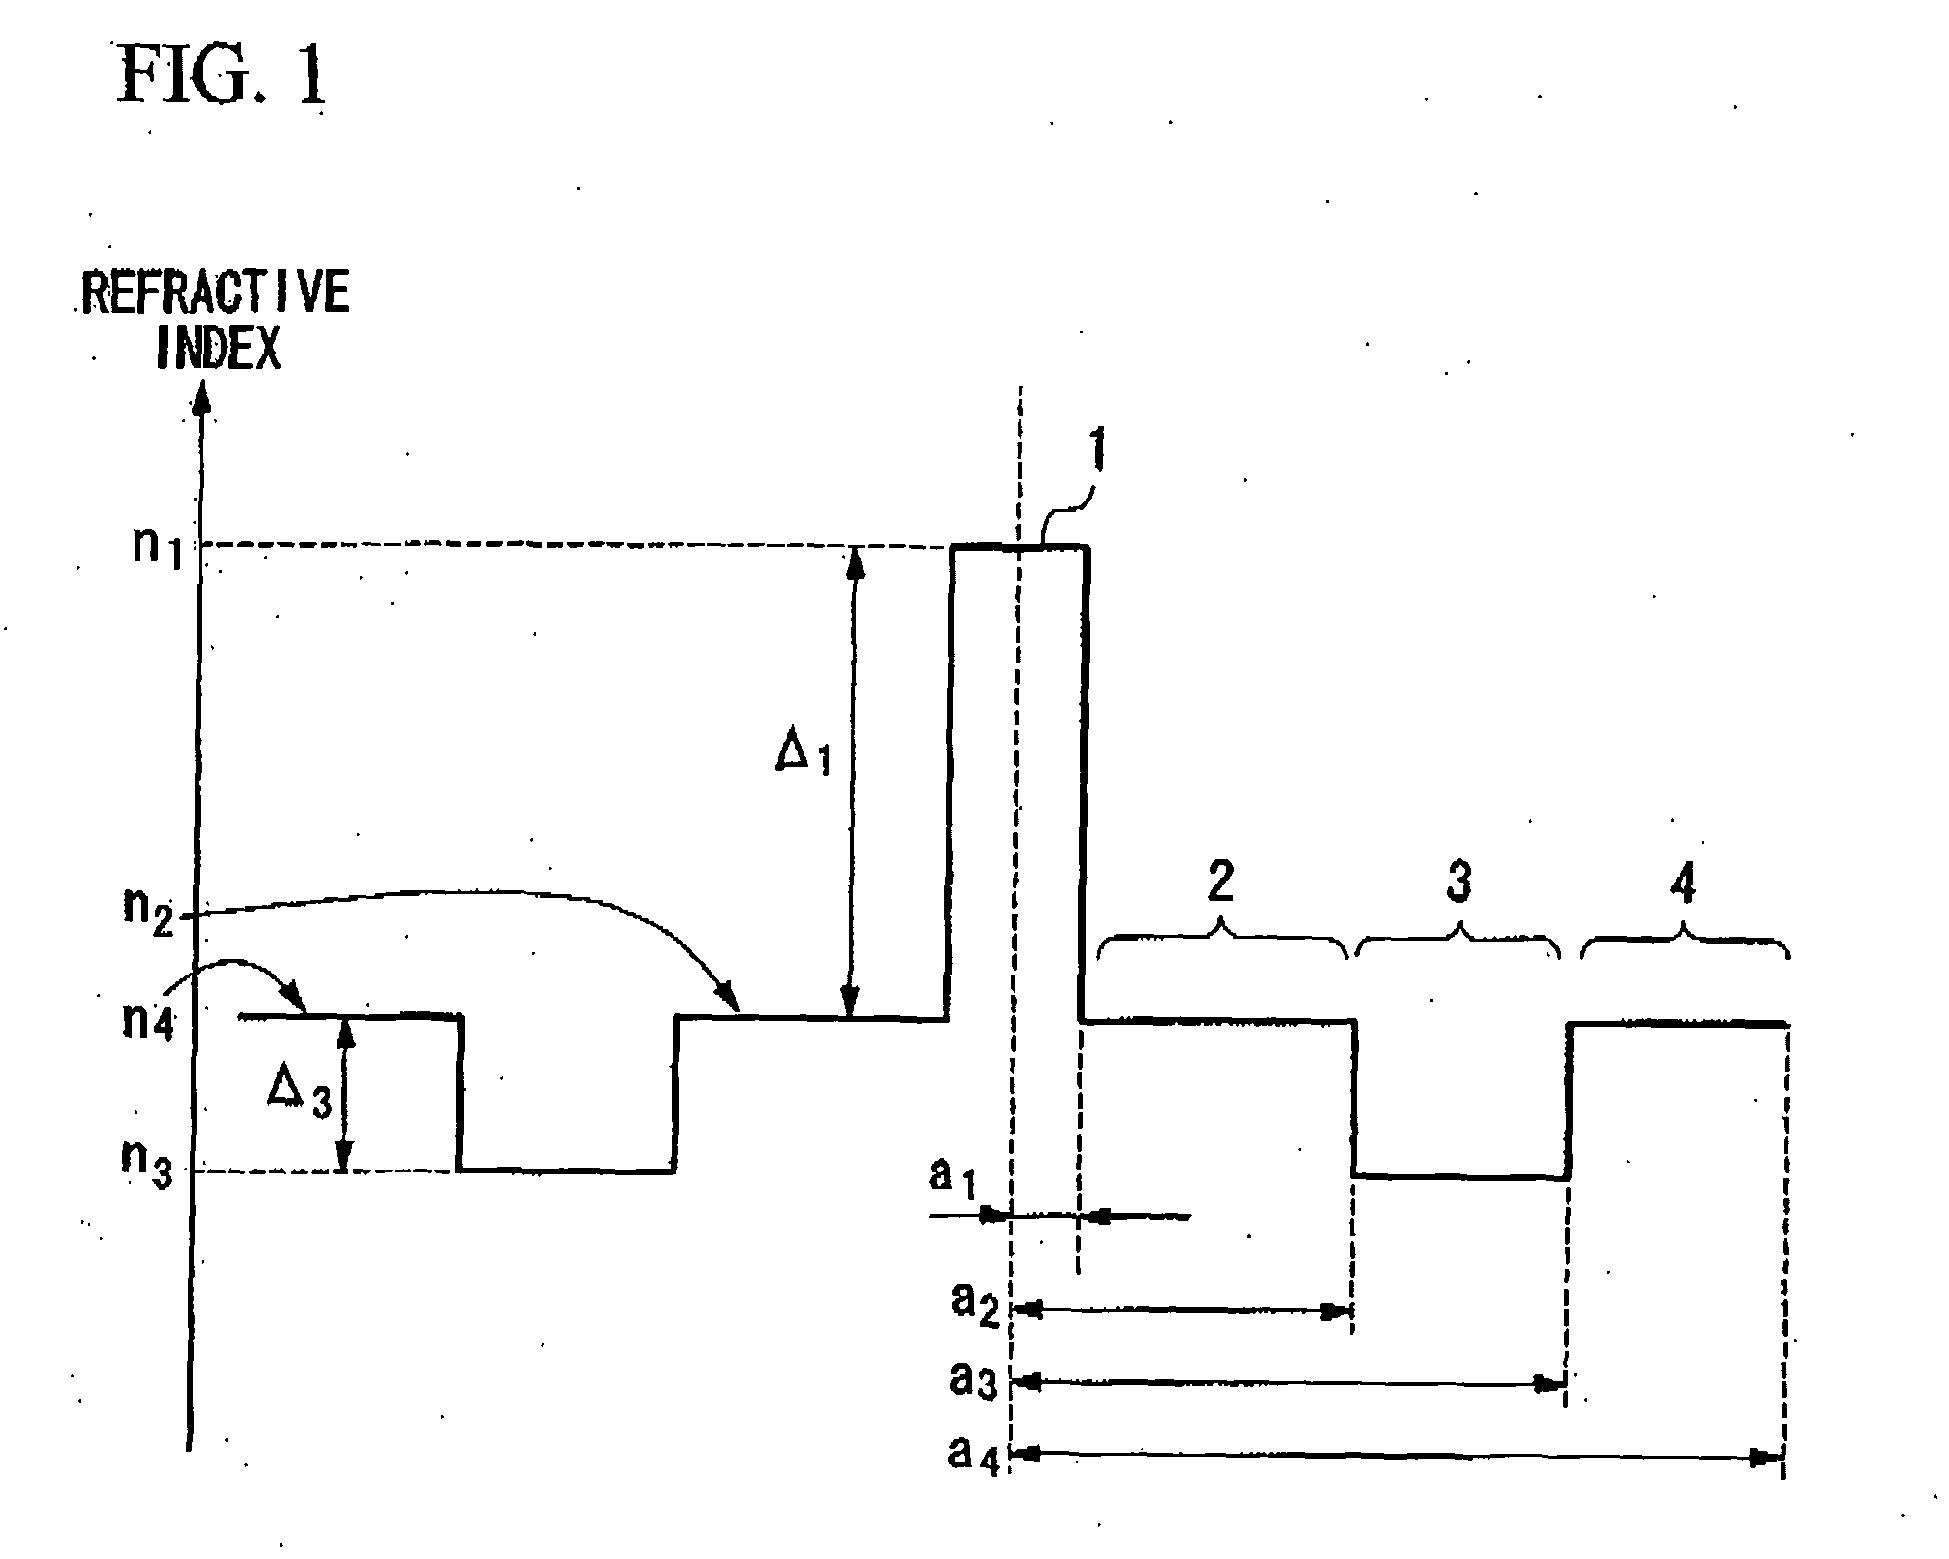 专利ep1657575a1 - optical